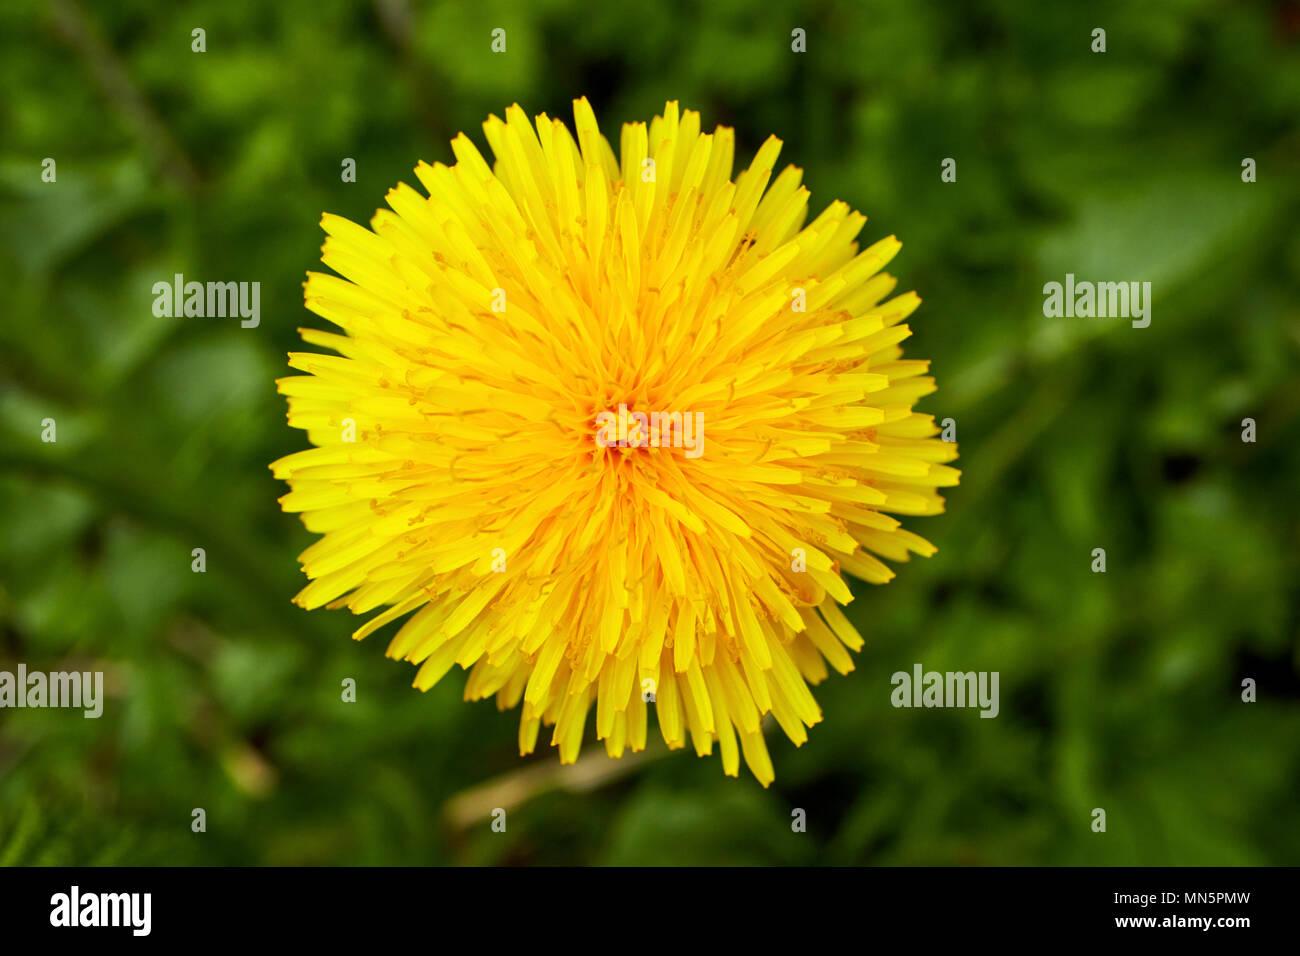 Dandelion Taraxacum Bright Yellow Flower Head Flowering Early In May